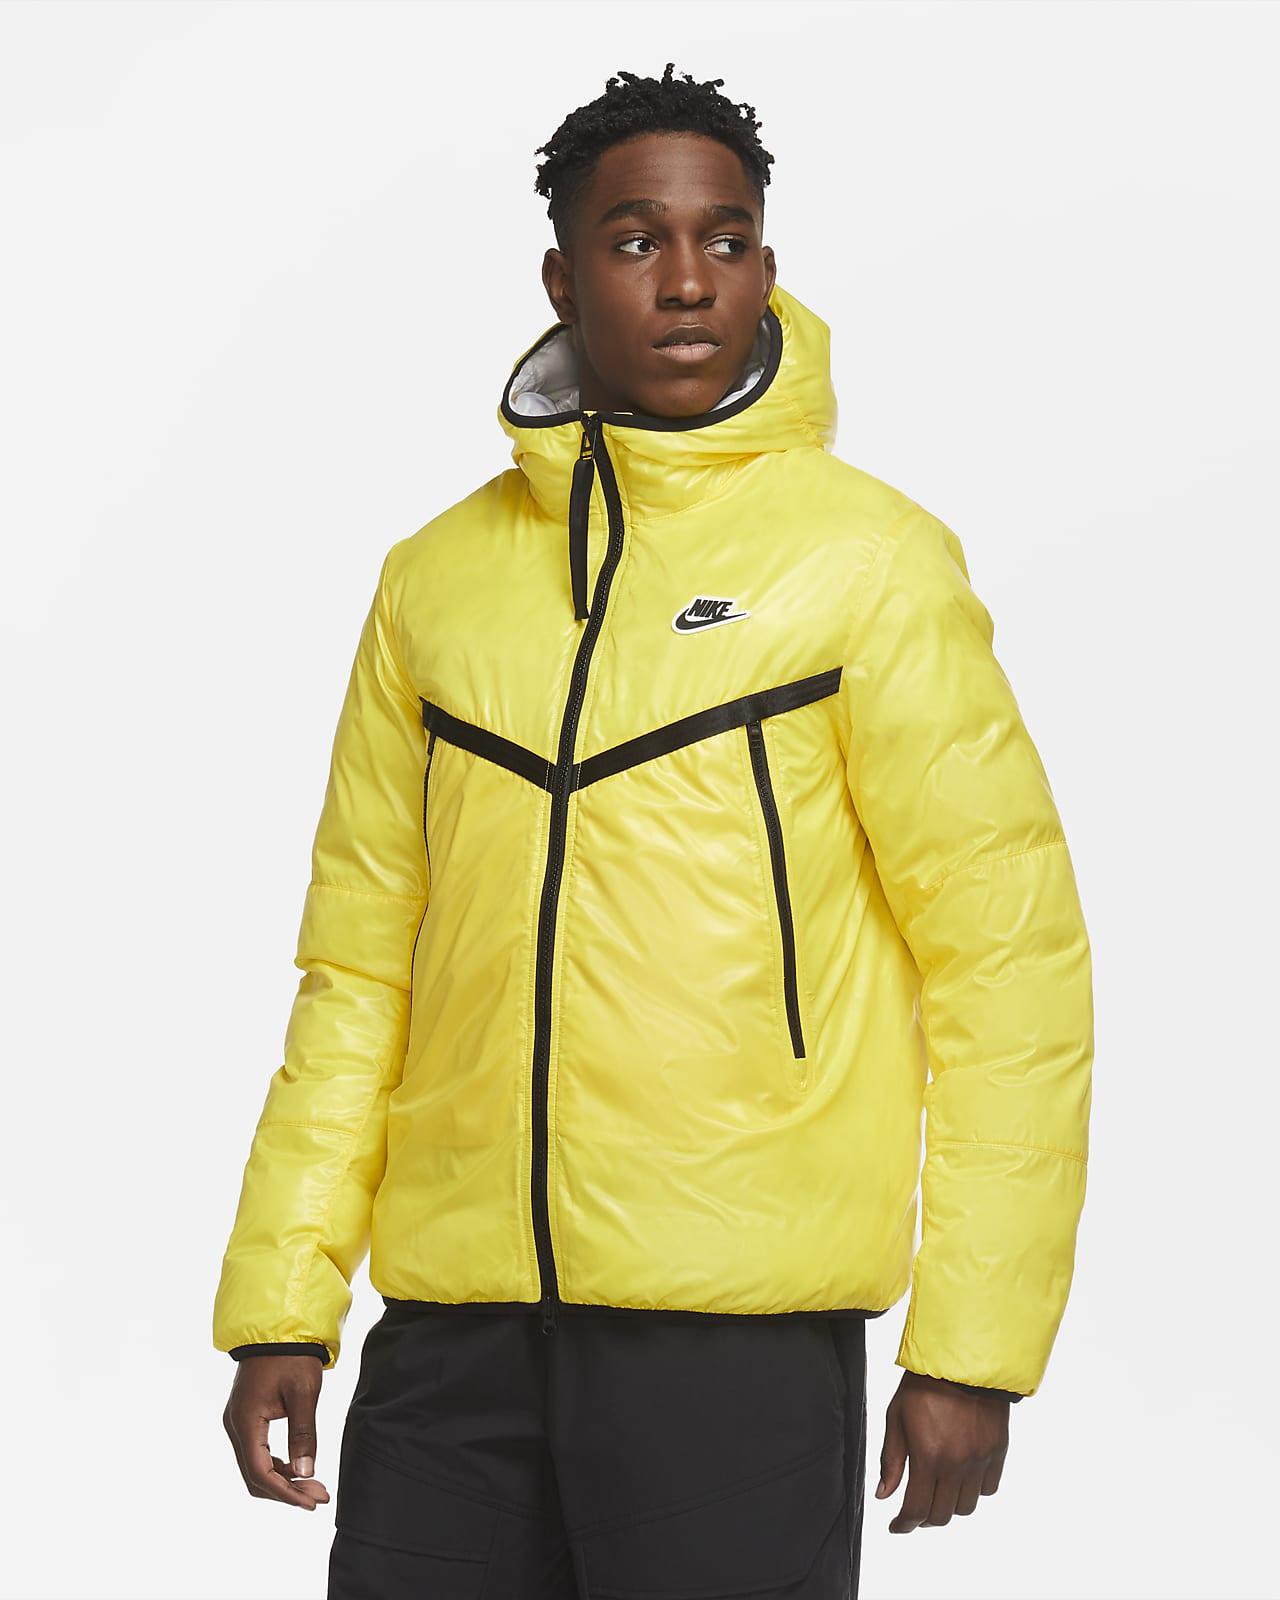 Insignificante operador becerro  Nike Sportswear Synthetic-Fill Windrunner Men's Repel Jacket. Nike.com